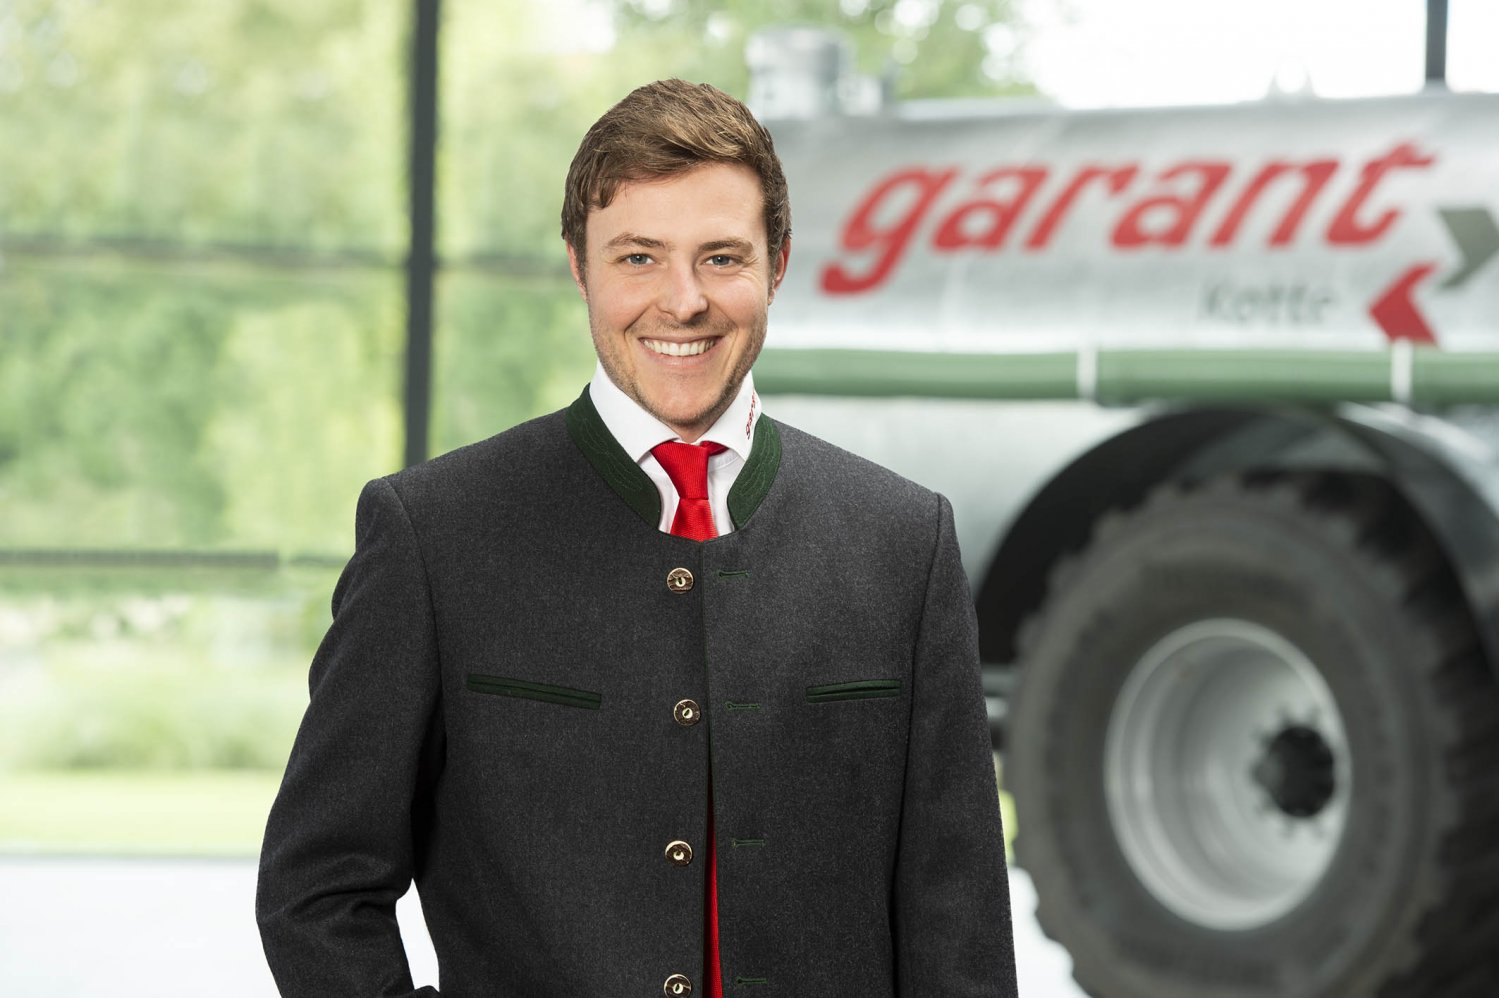 Markus Pschierl